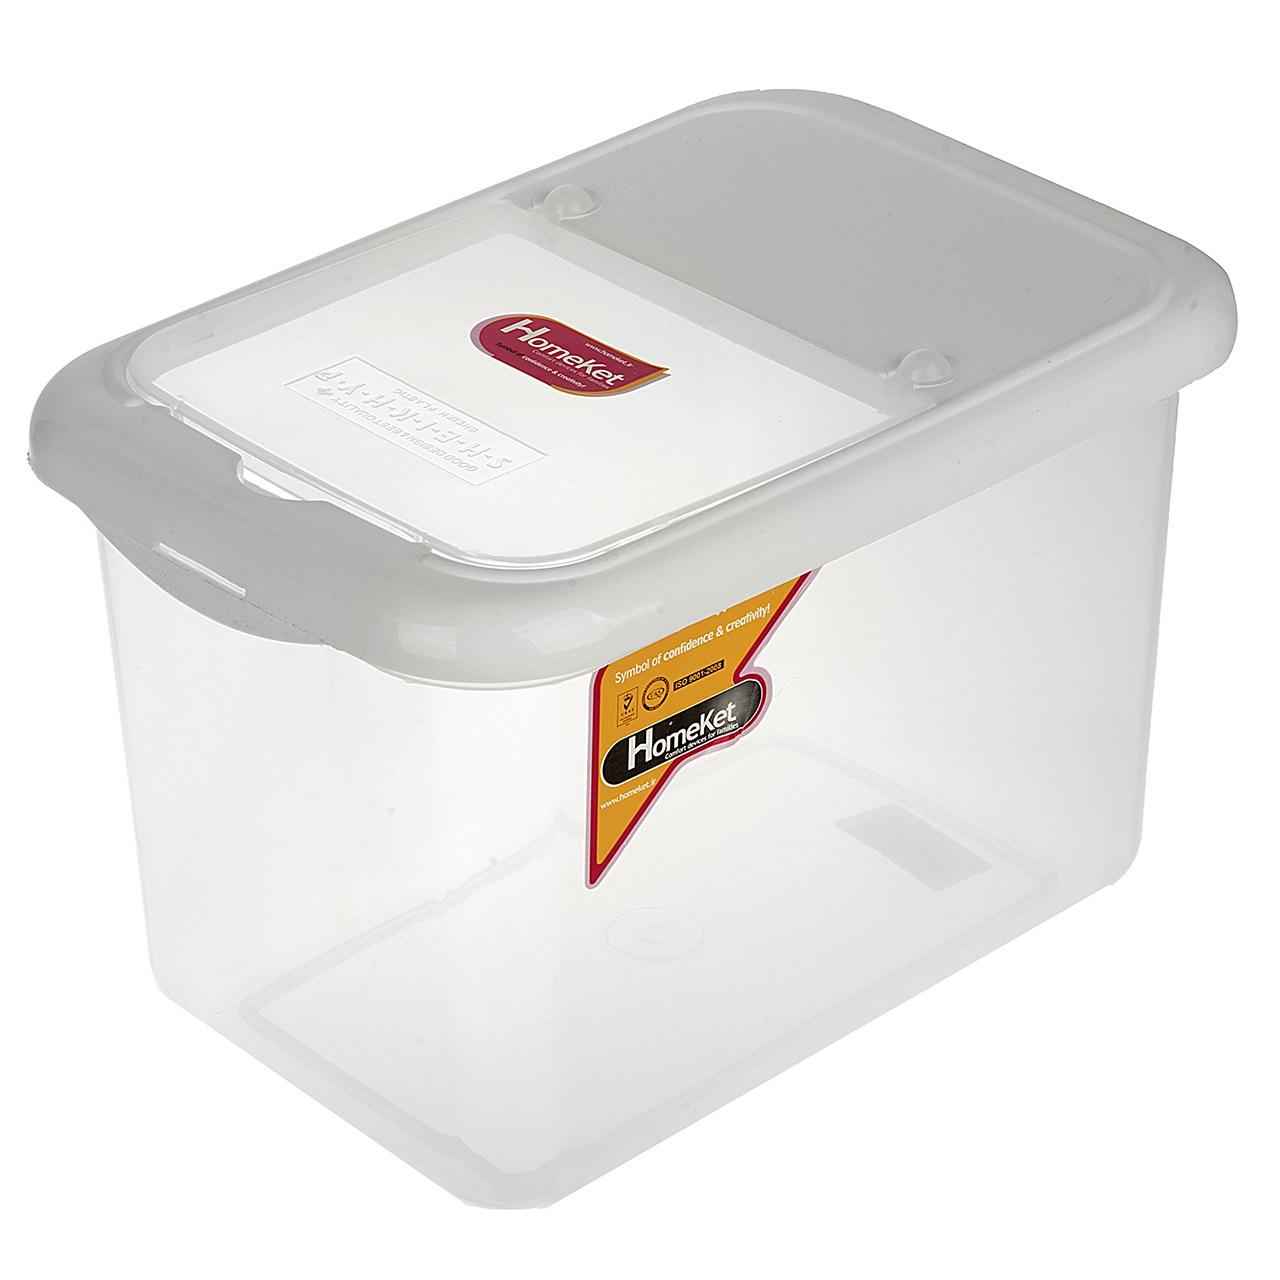 ظرف برنج هوم کت کد 0723 - ظرفیت 10 کیلوگرم